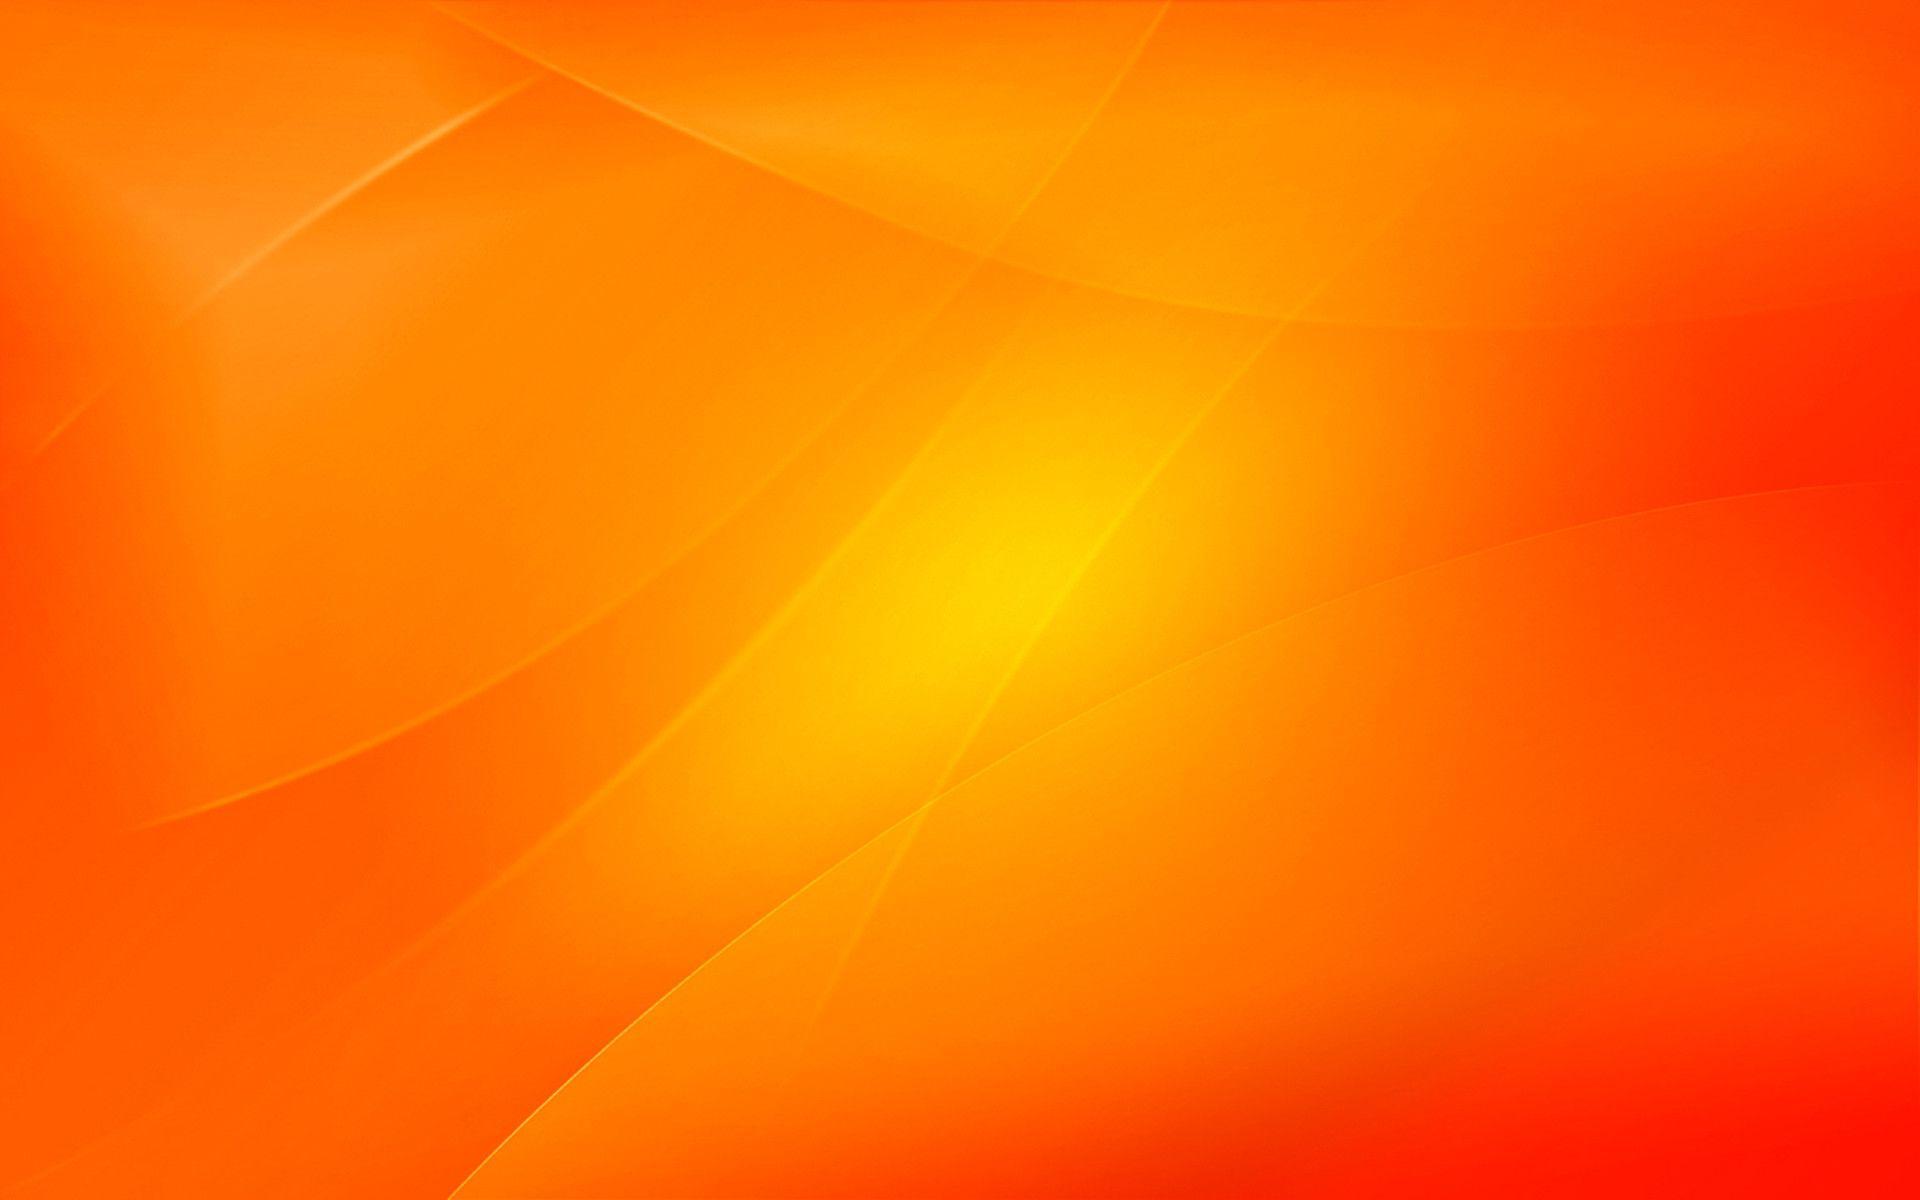 Orange Wallpapers Top Free Orange Backgrounds